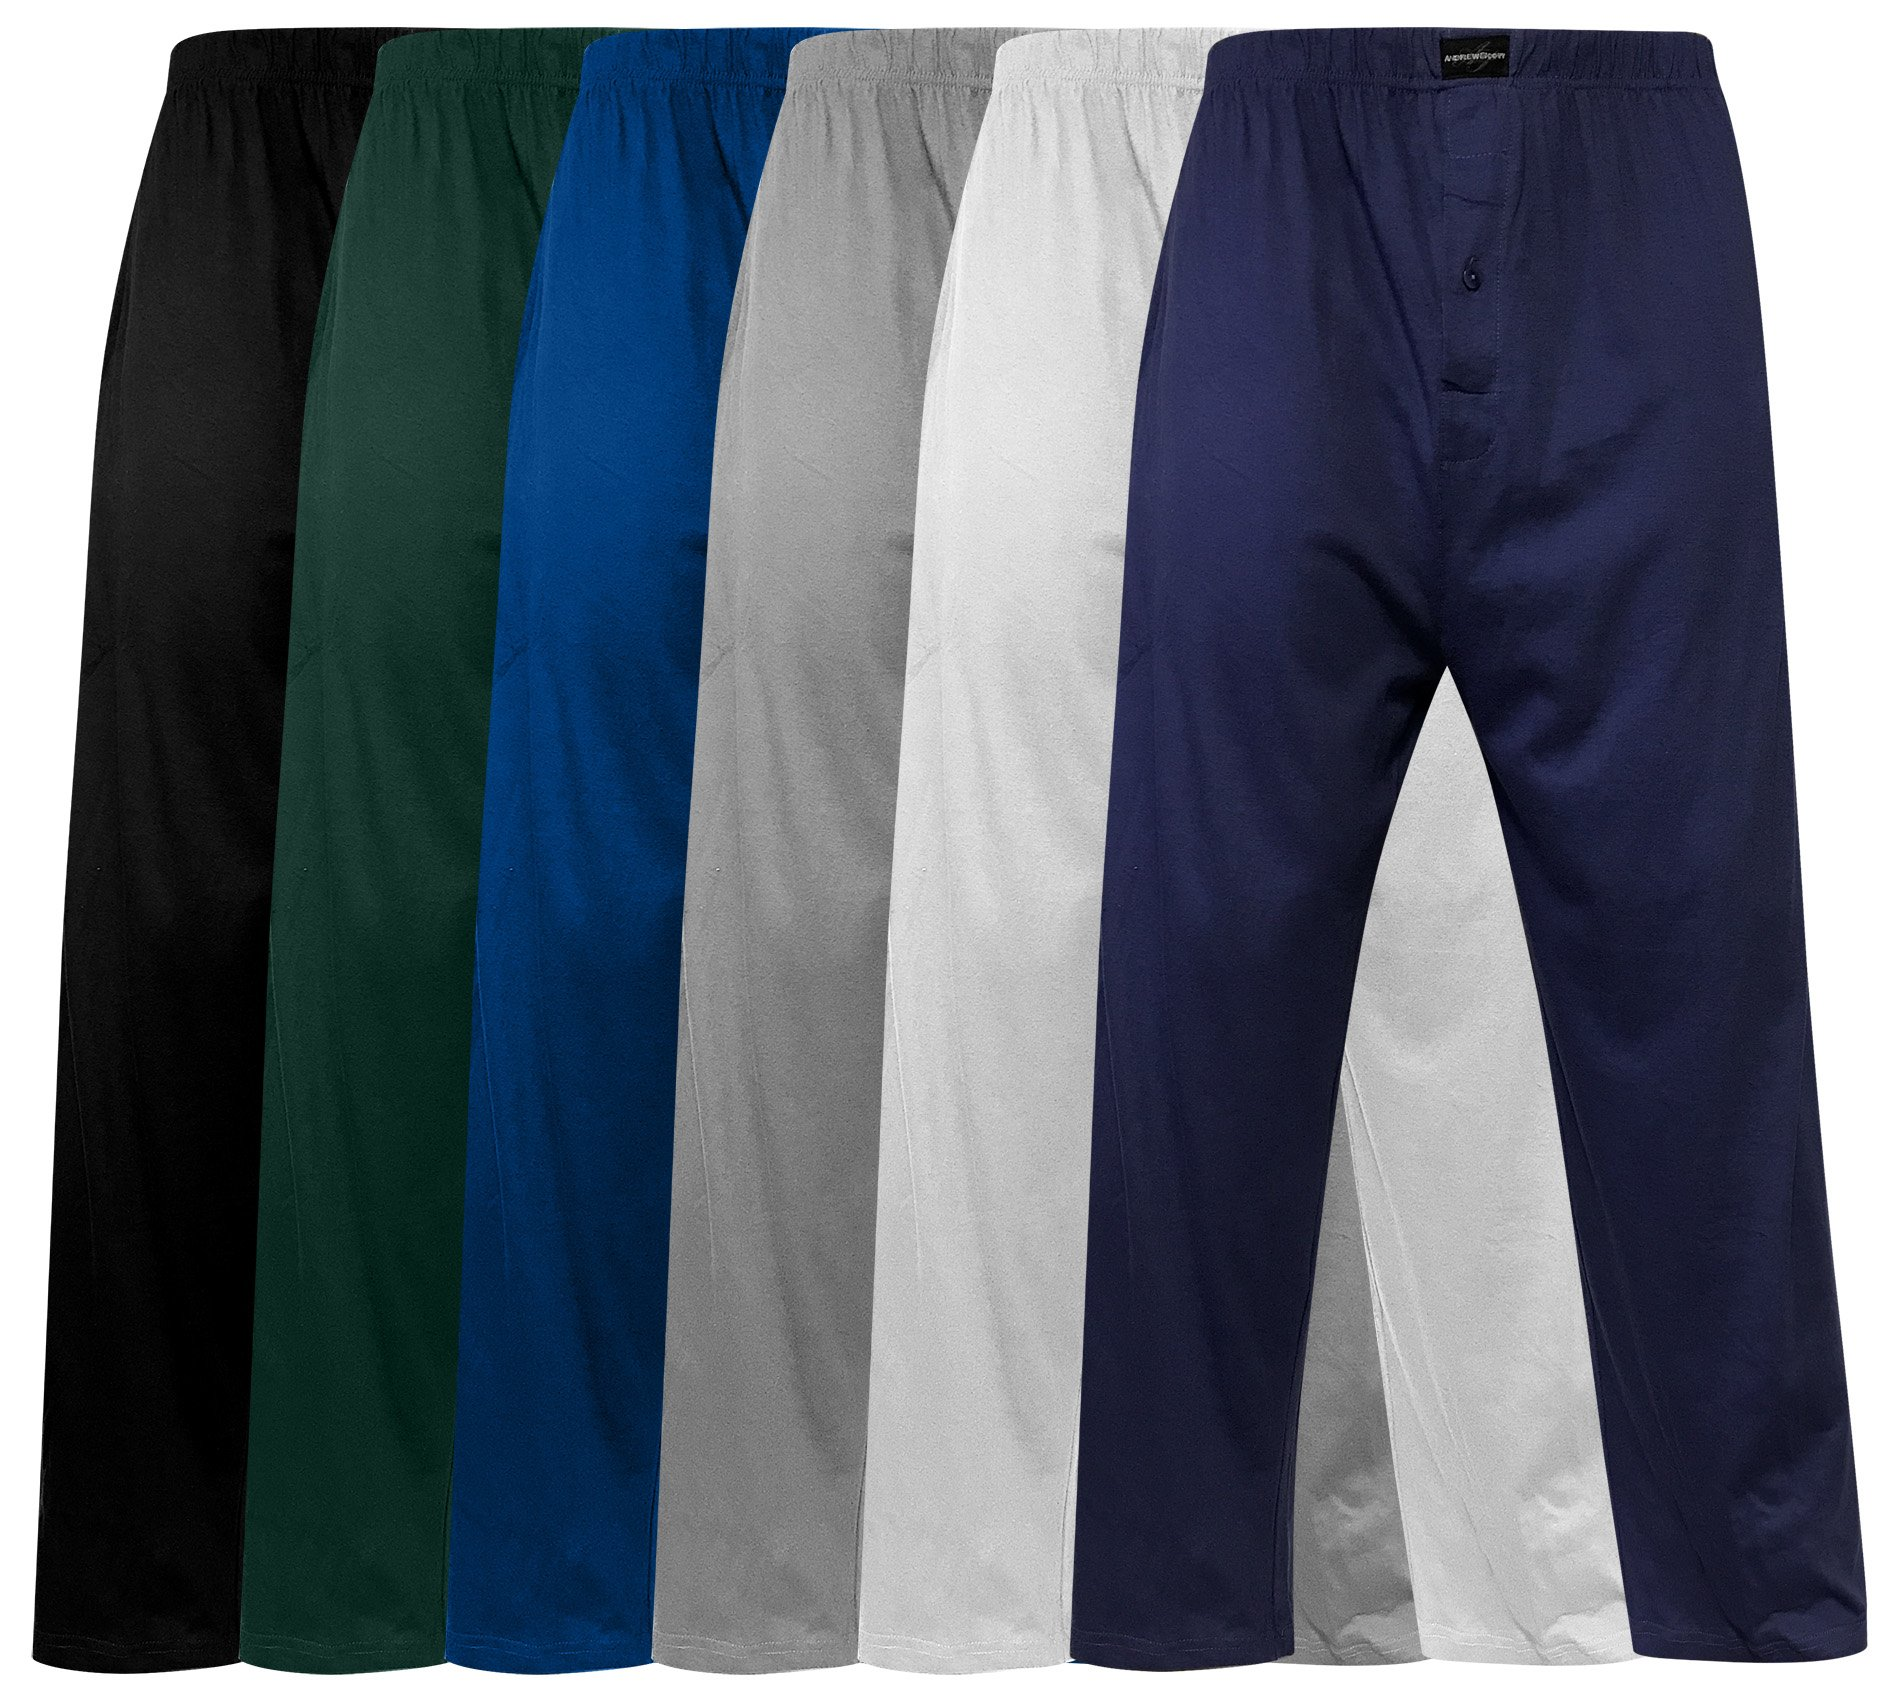 Andrew Scott Men's Pack of 6 Lightweight 100% Cotton Yoga Lounge & Sleep Pant (MEDIUM, 6 Pack-Assorted Color)